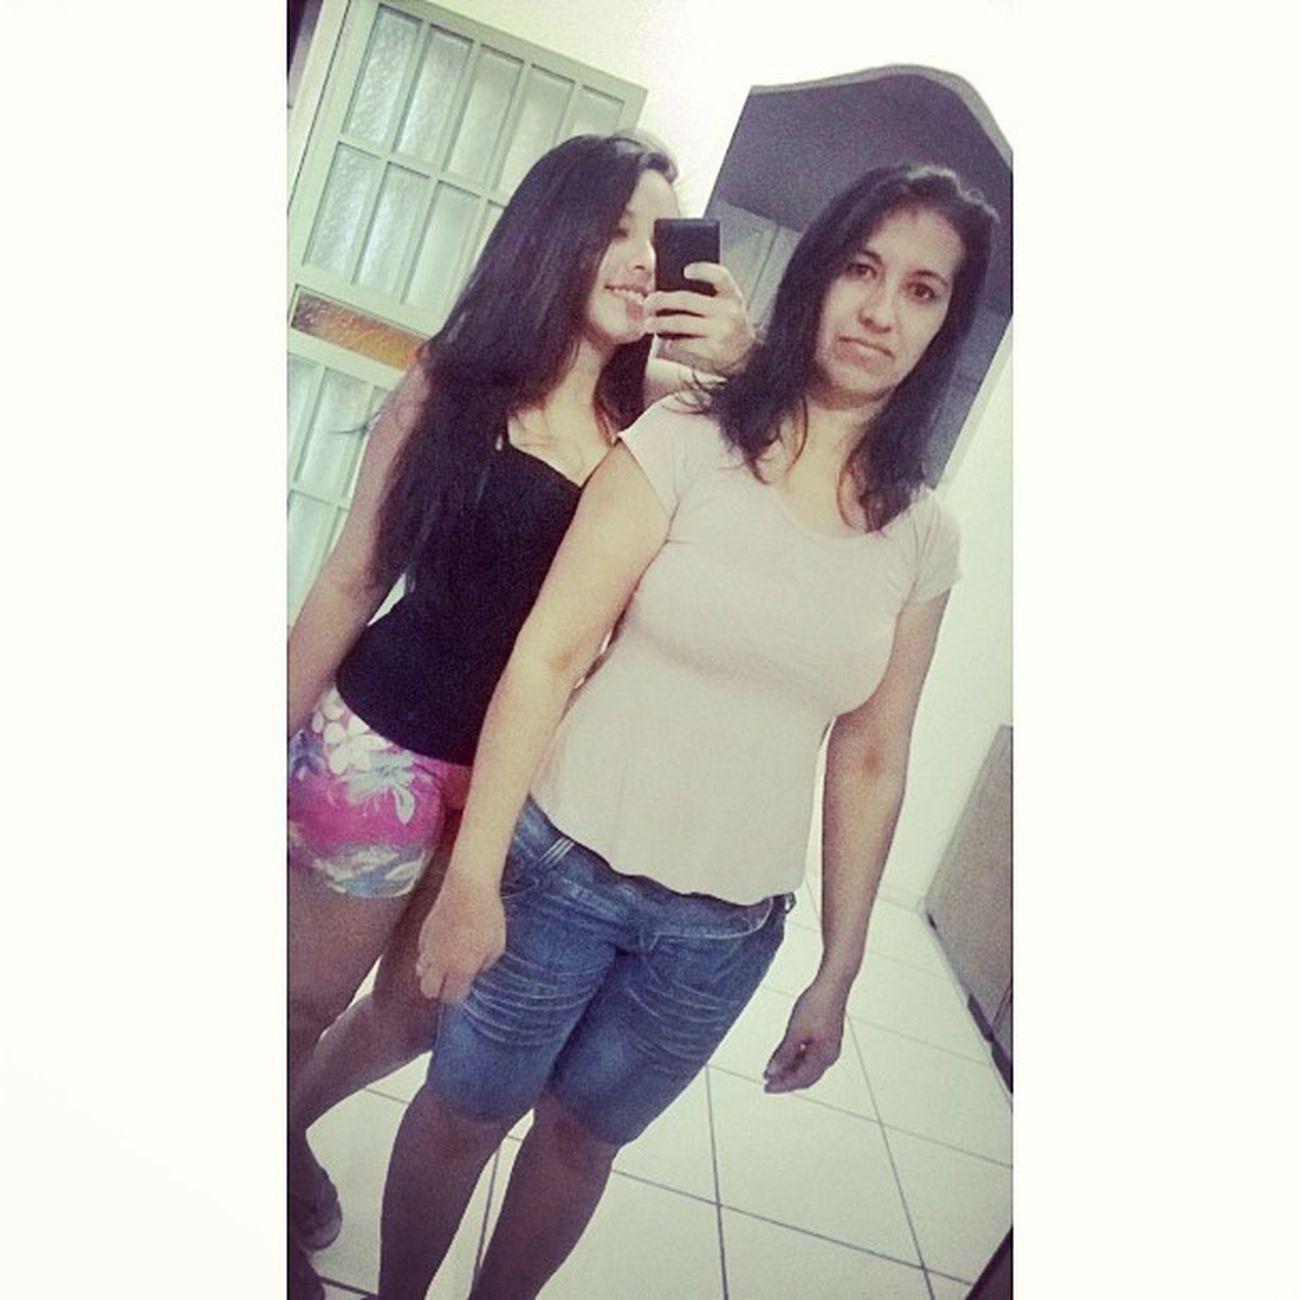 Marinda 😍 Rainha Mamãe Minhalinda 💖💕